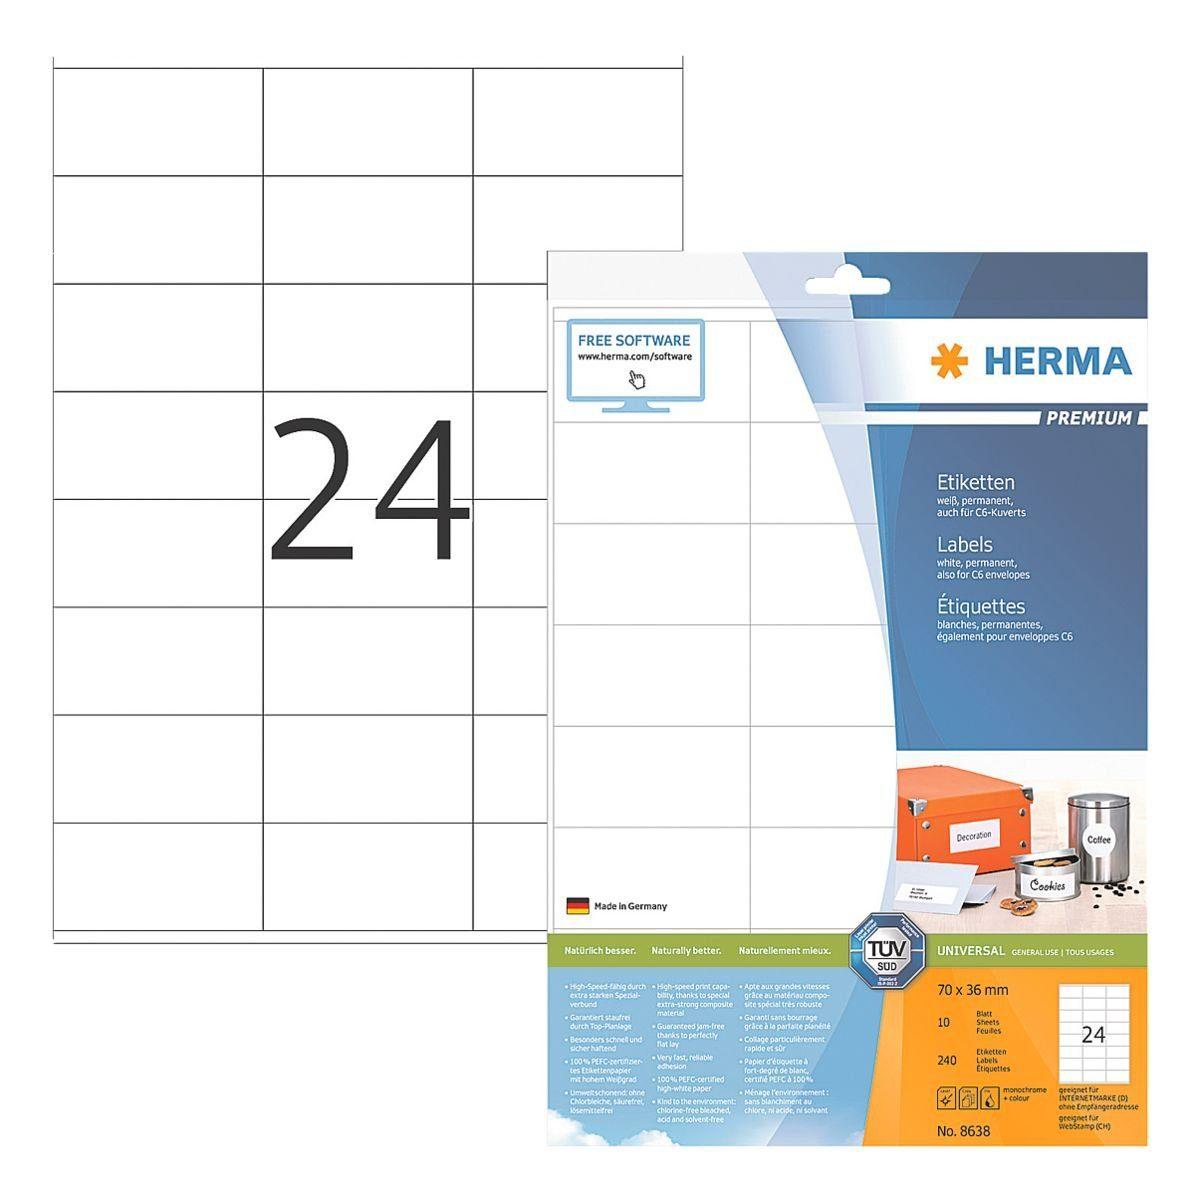 Herma 240er-Pack Universal-Klebeetiketten »8638«